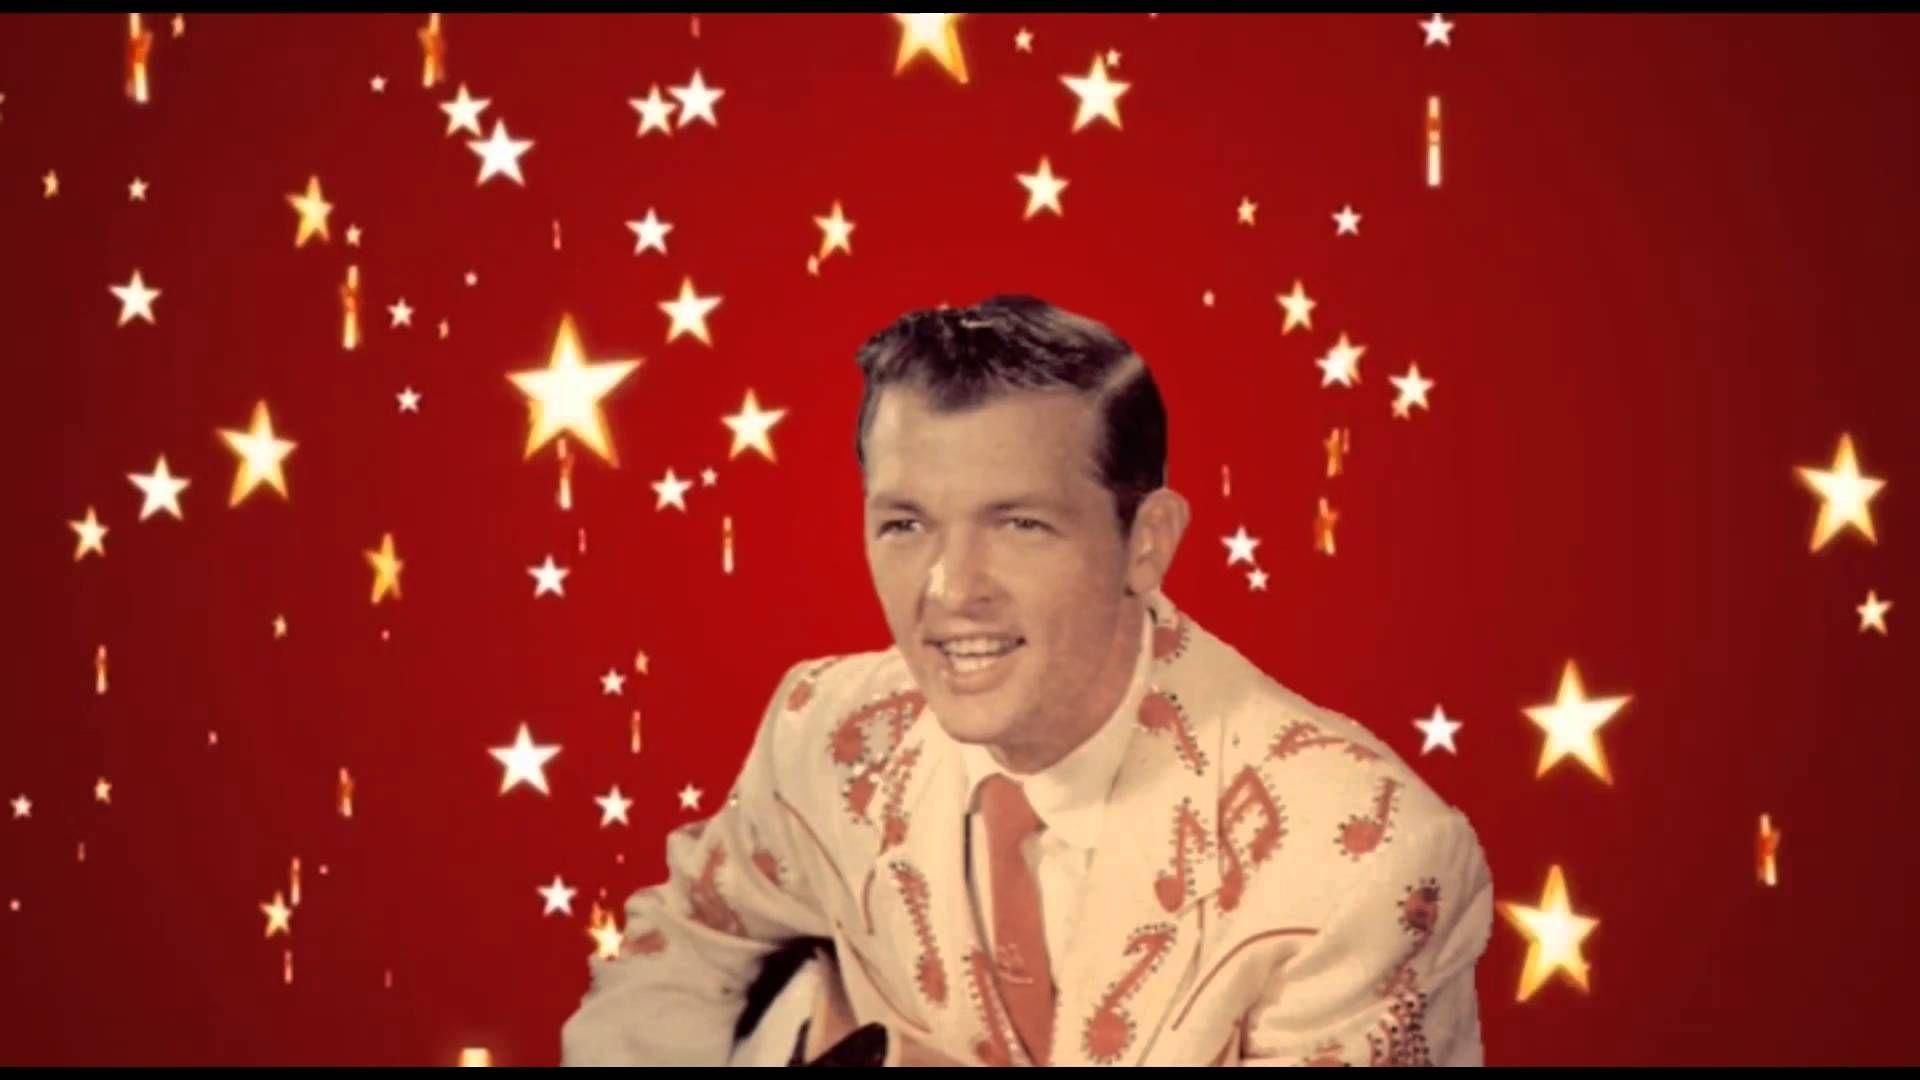 Jingle Bell Rock- Bobby Helms | Classic christmas songs, Christmas song, Jingle bells